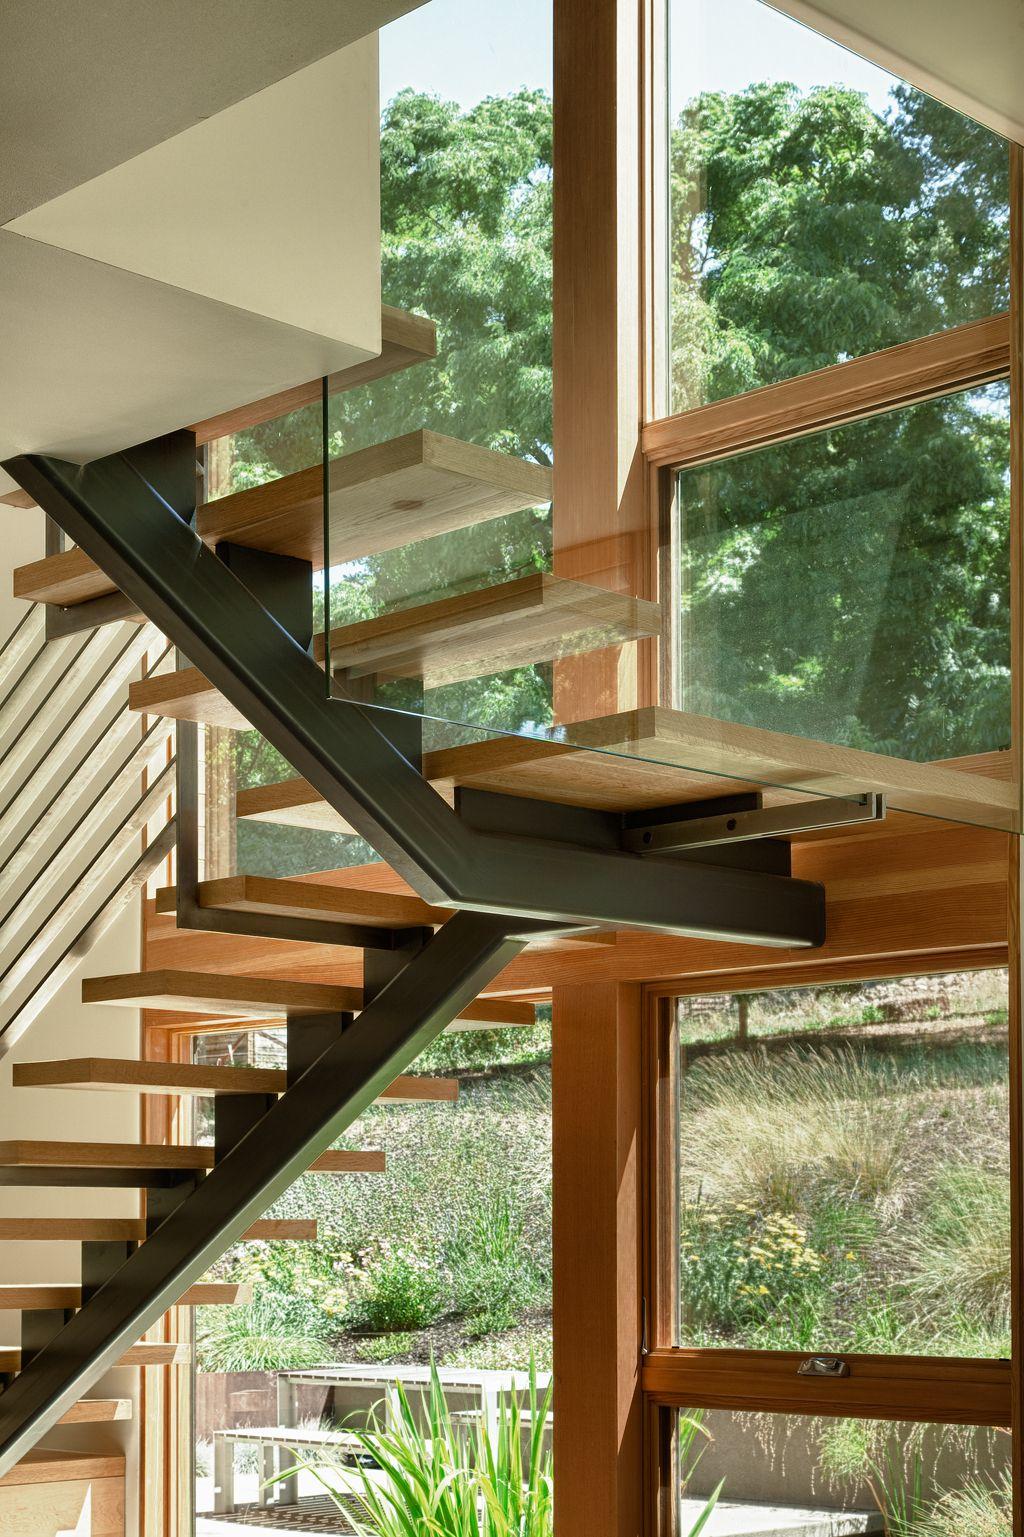 modern architecture - open riser stair detail, glass rail ...